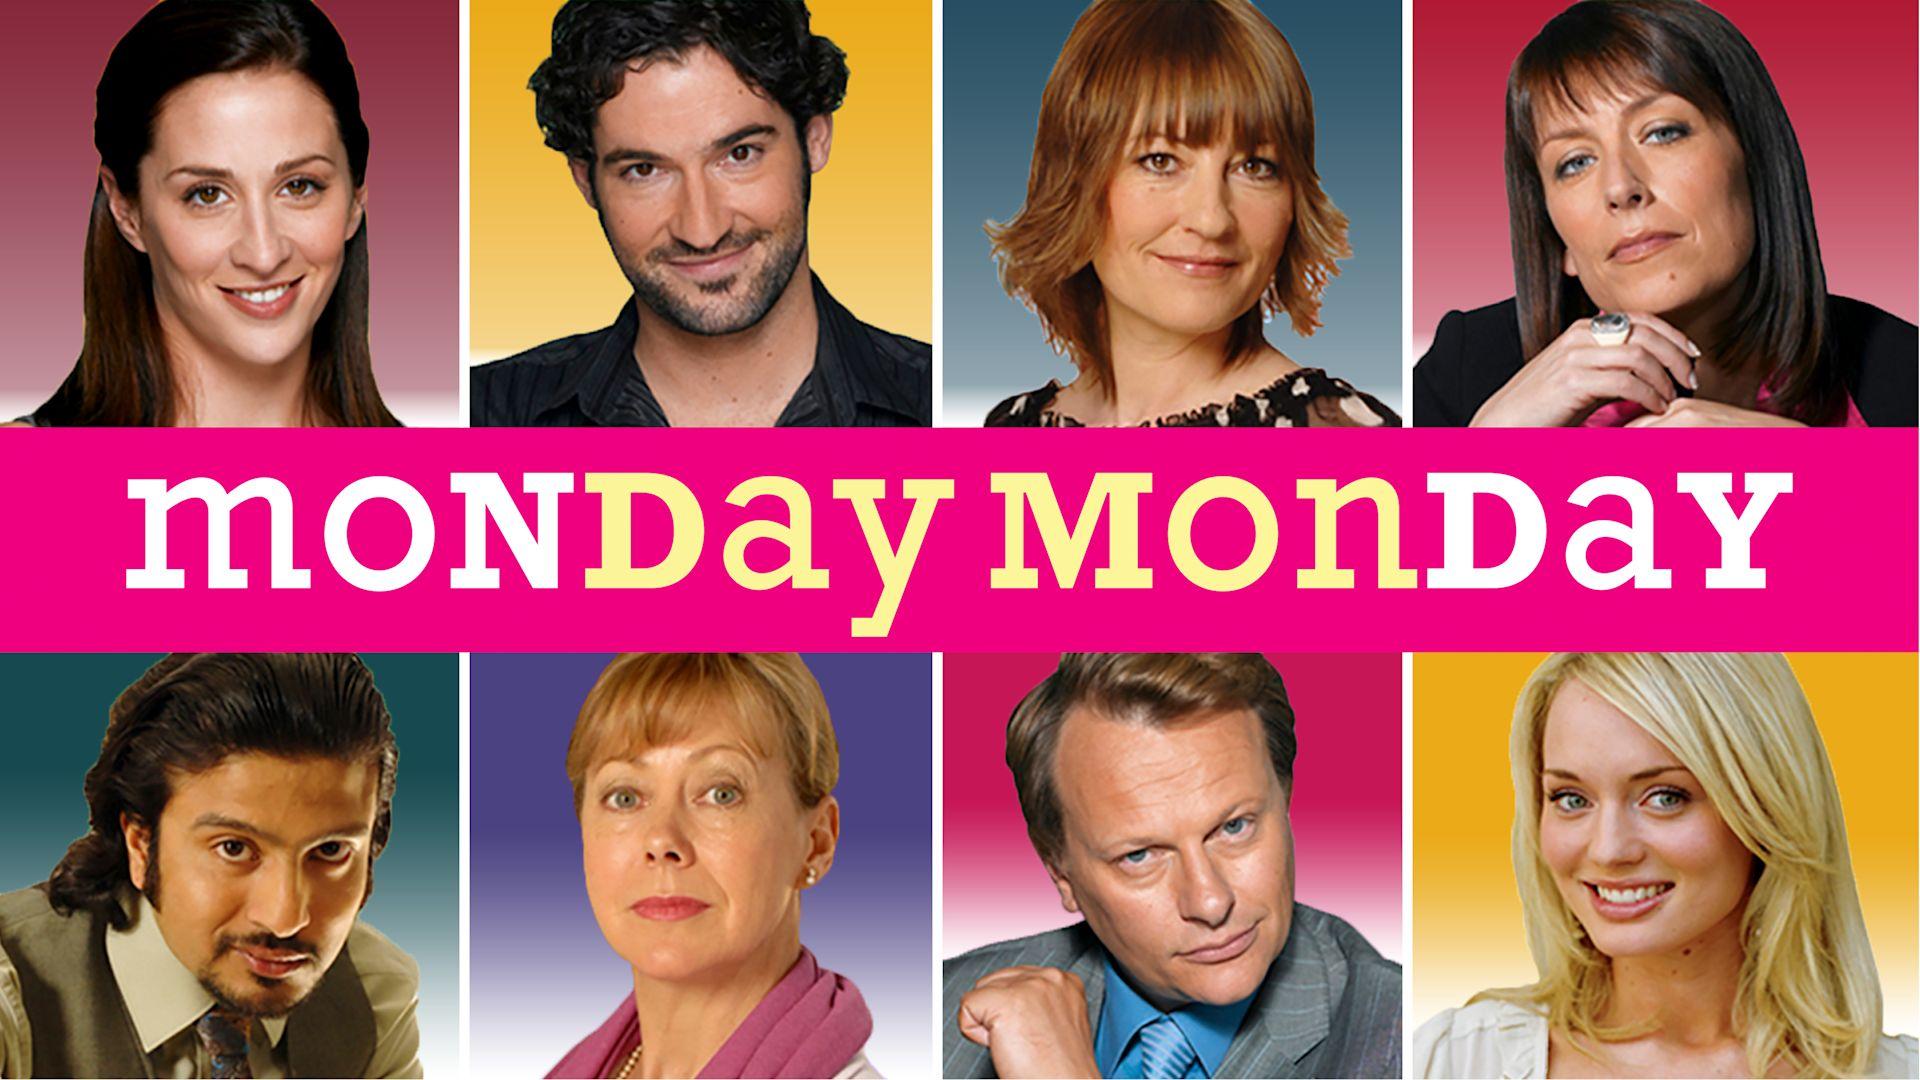 Monday Monday - Series 1